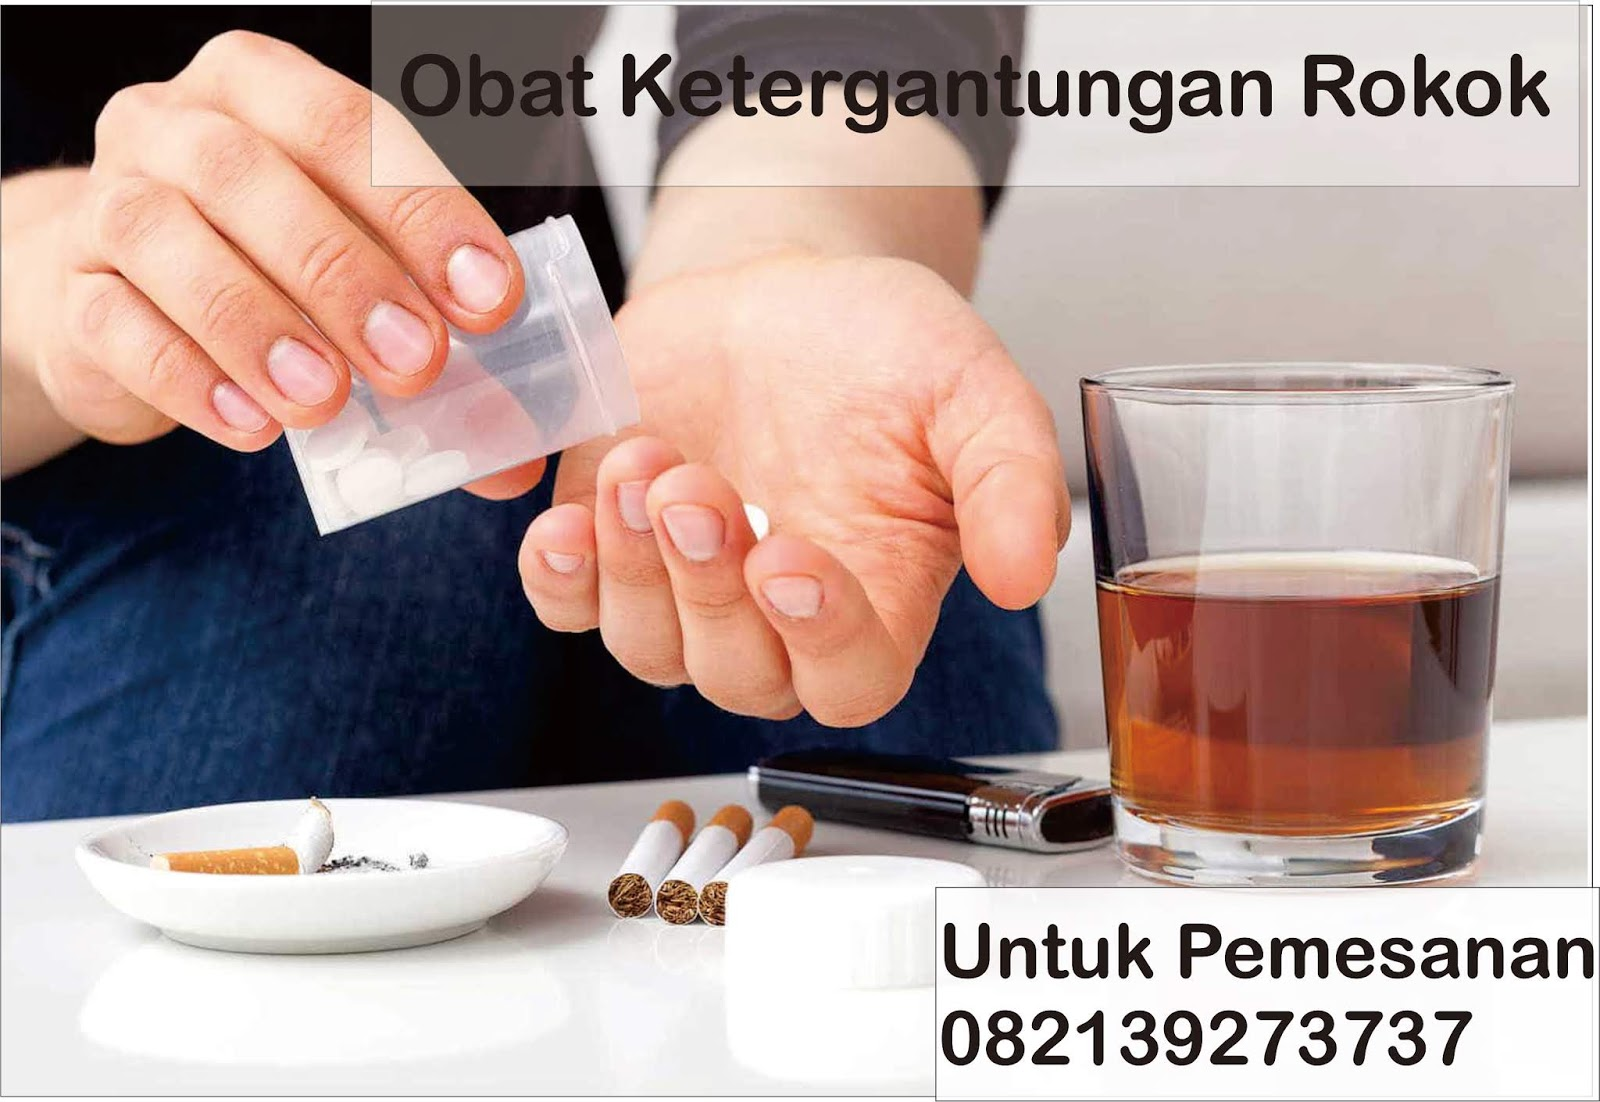 3 Cara Menghentikan kecanduan Rokok secara instan